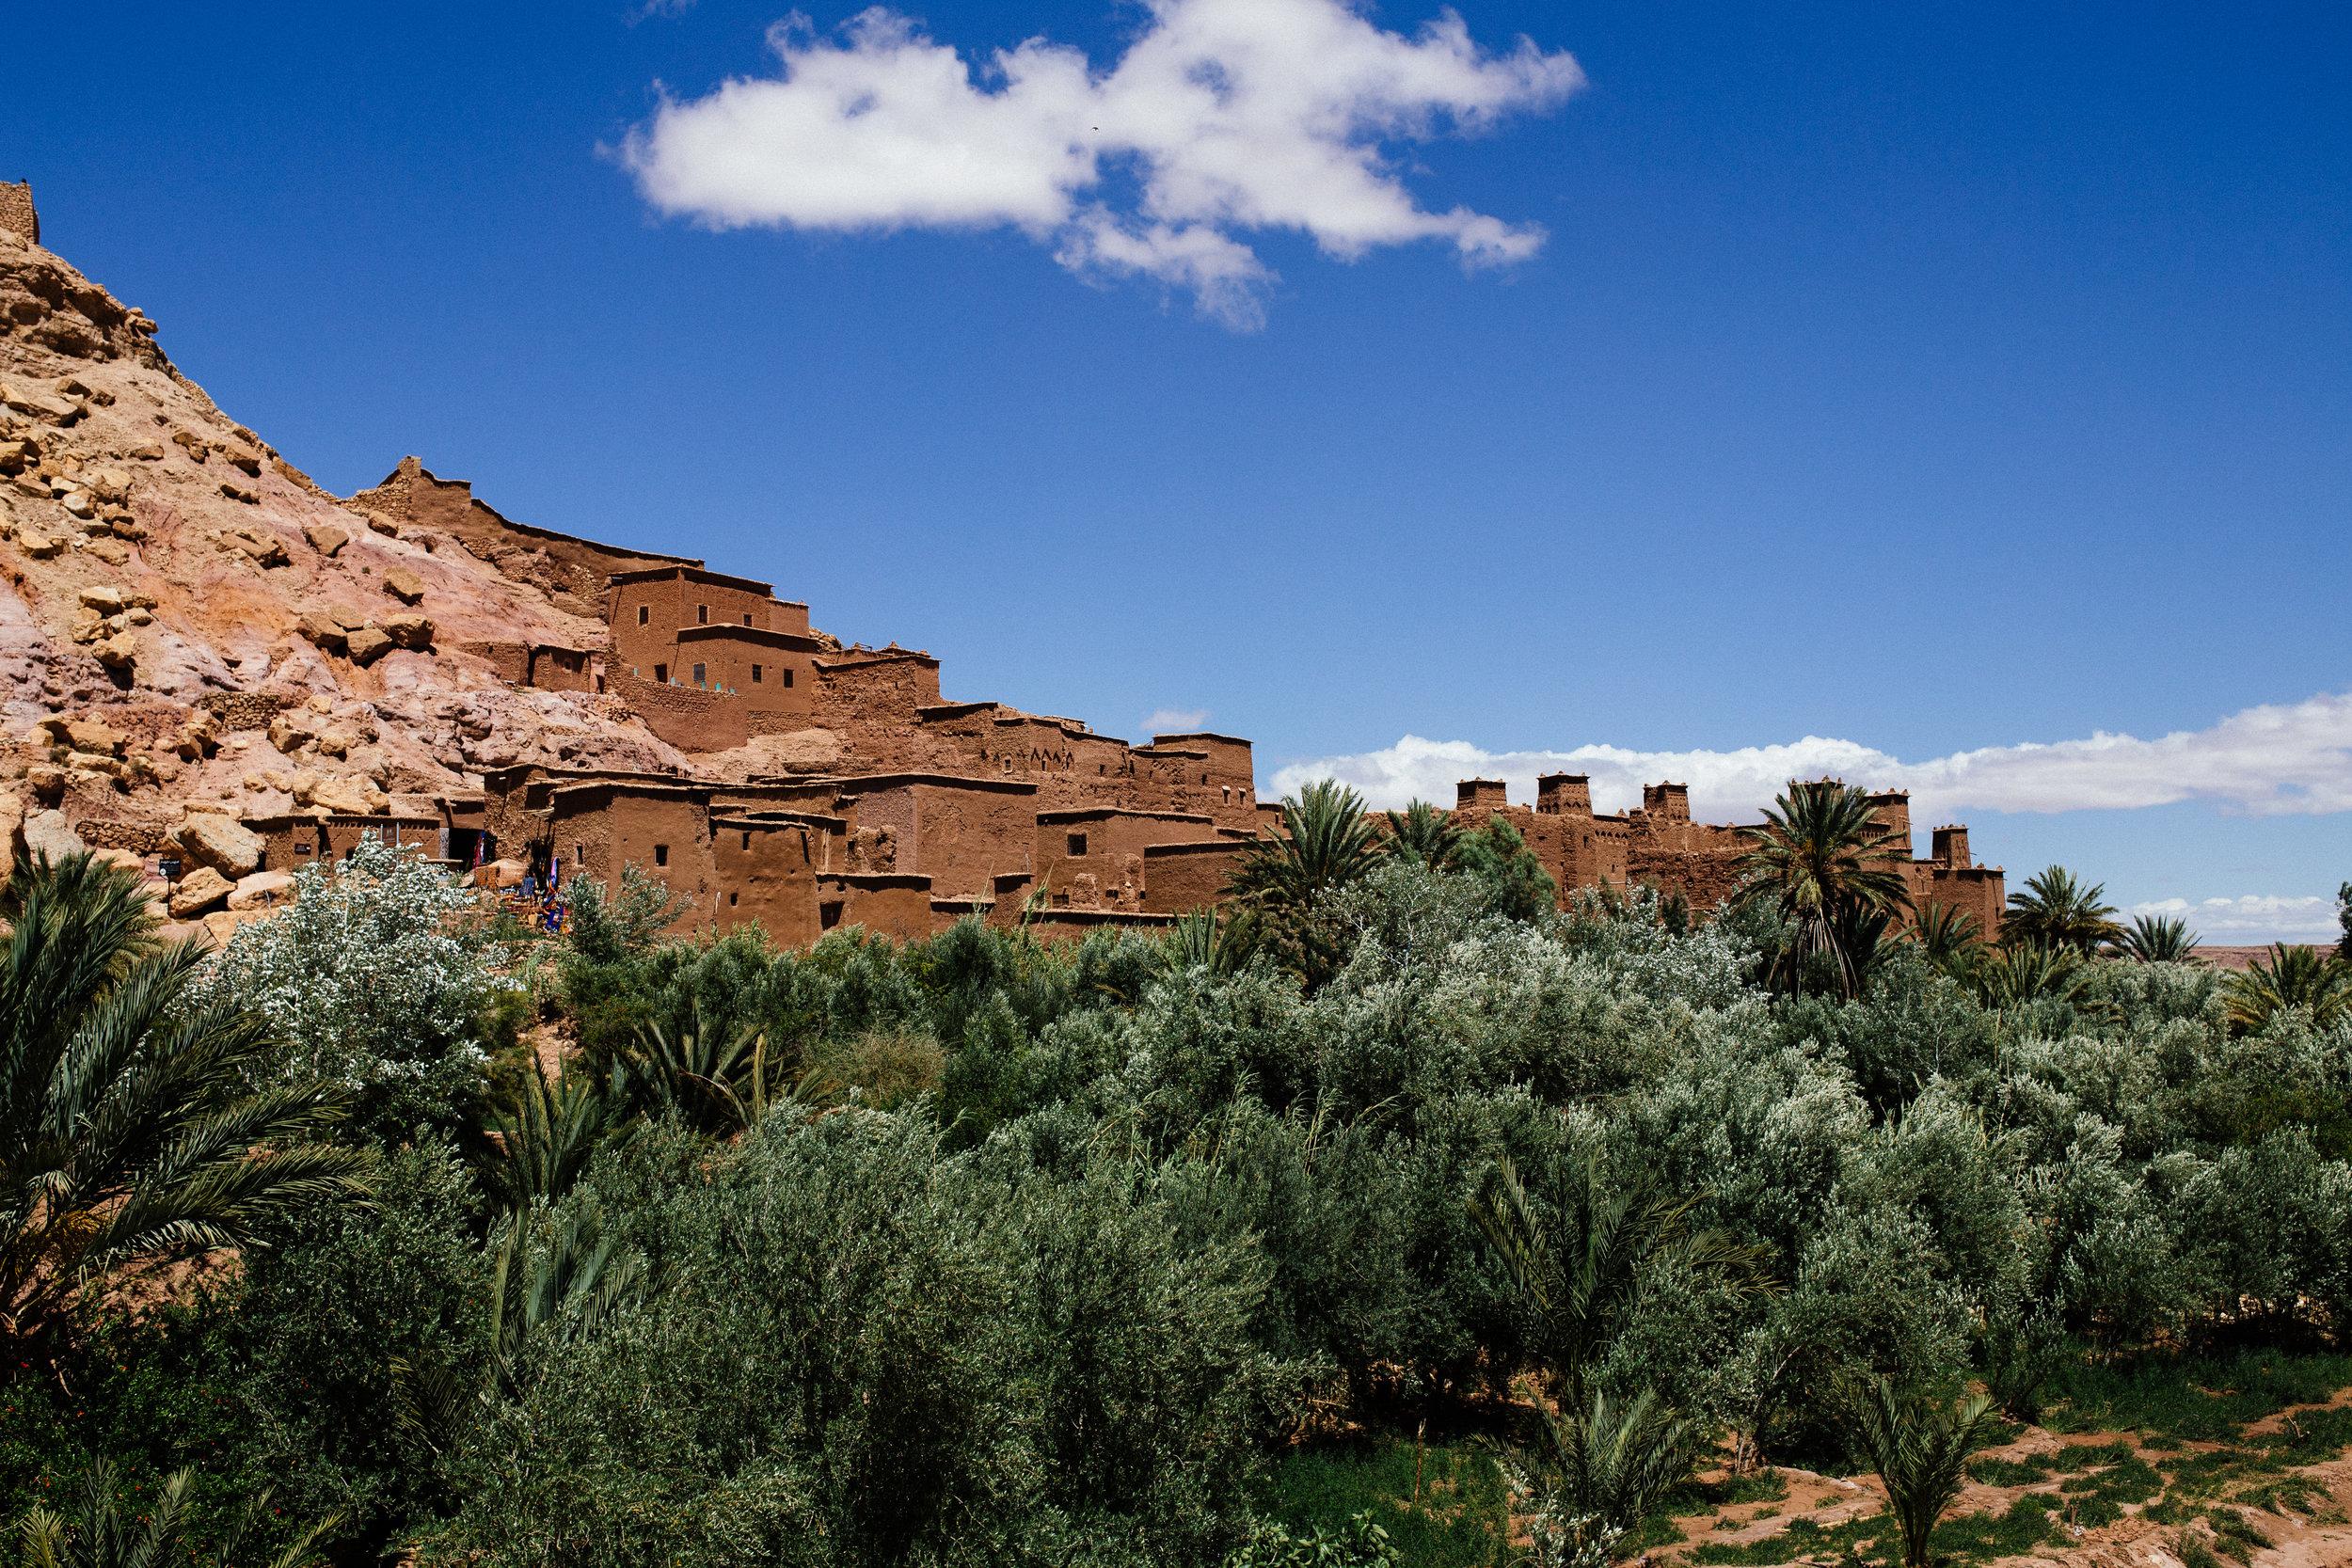 morocco-morocco travel-visit morocco-travel-travel photography-travel photographer-alina mendoza-alina mendoza photography-34.jpg